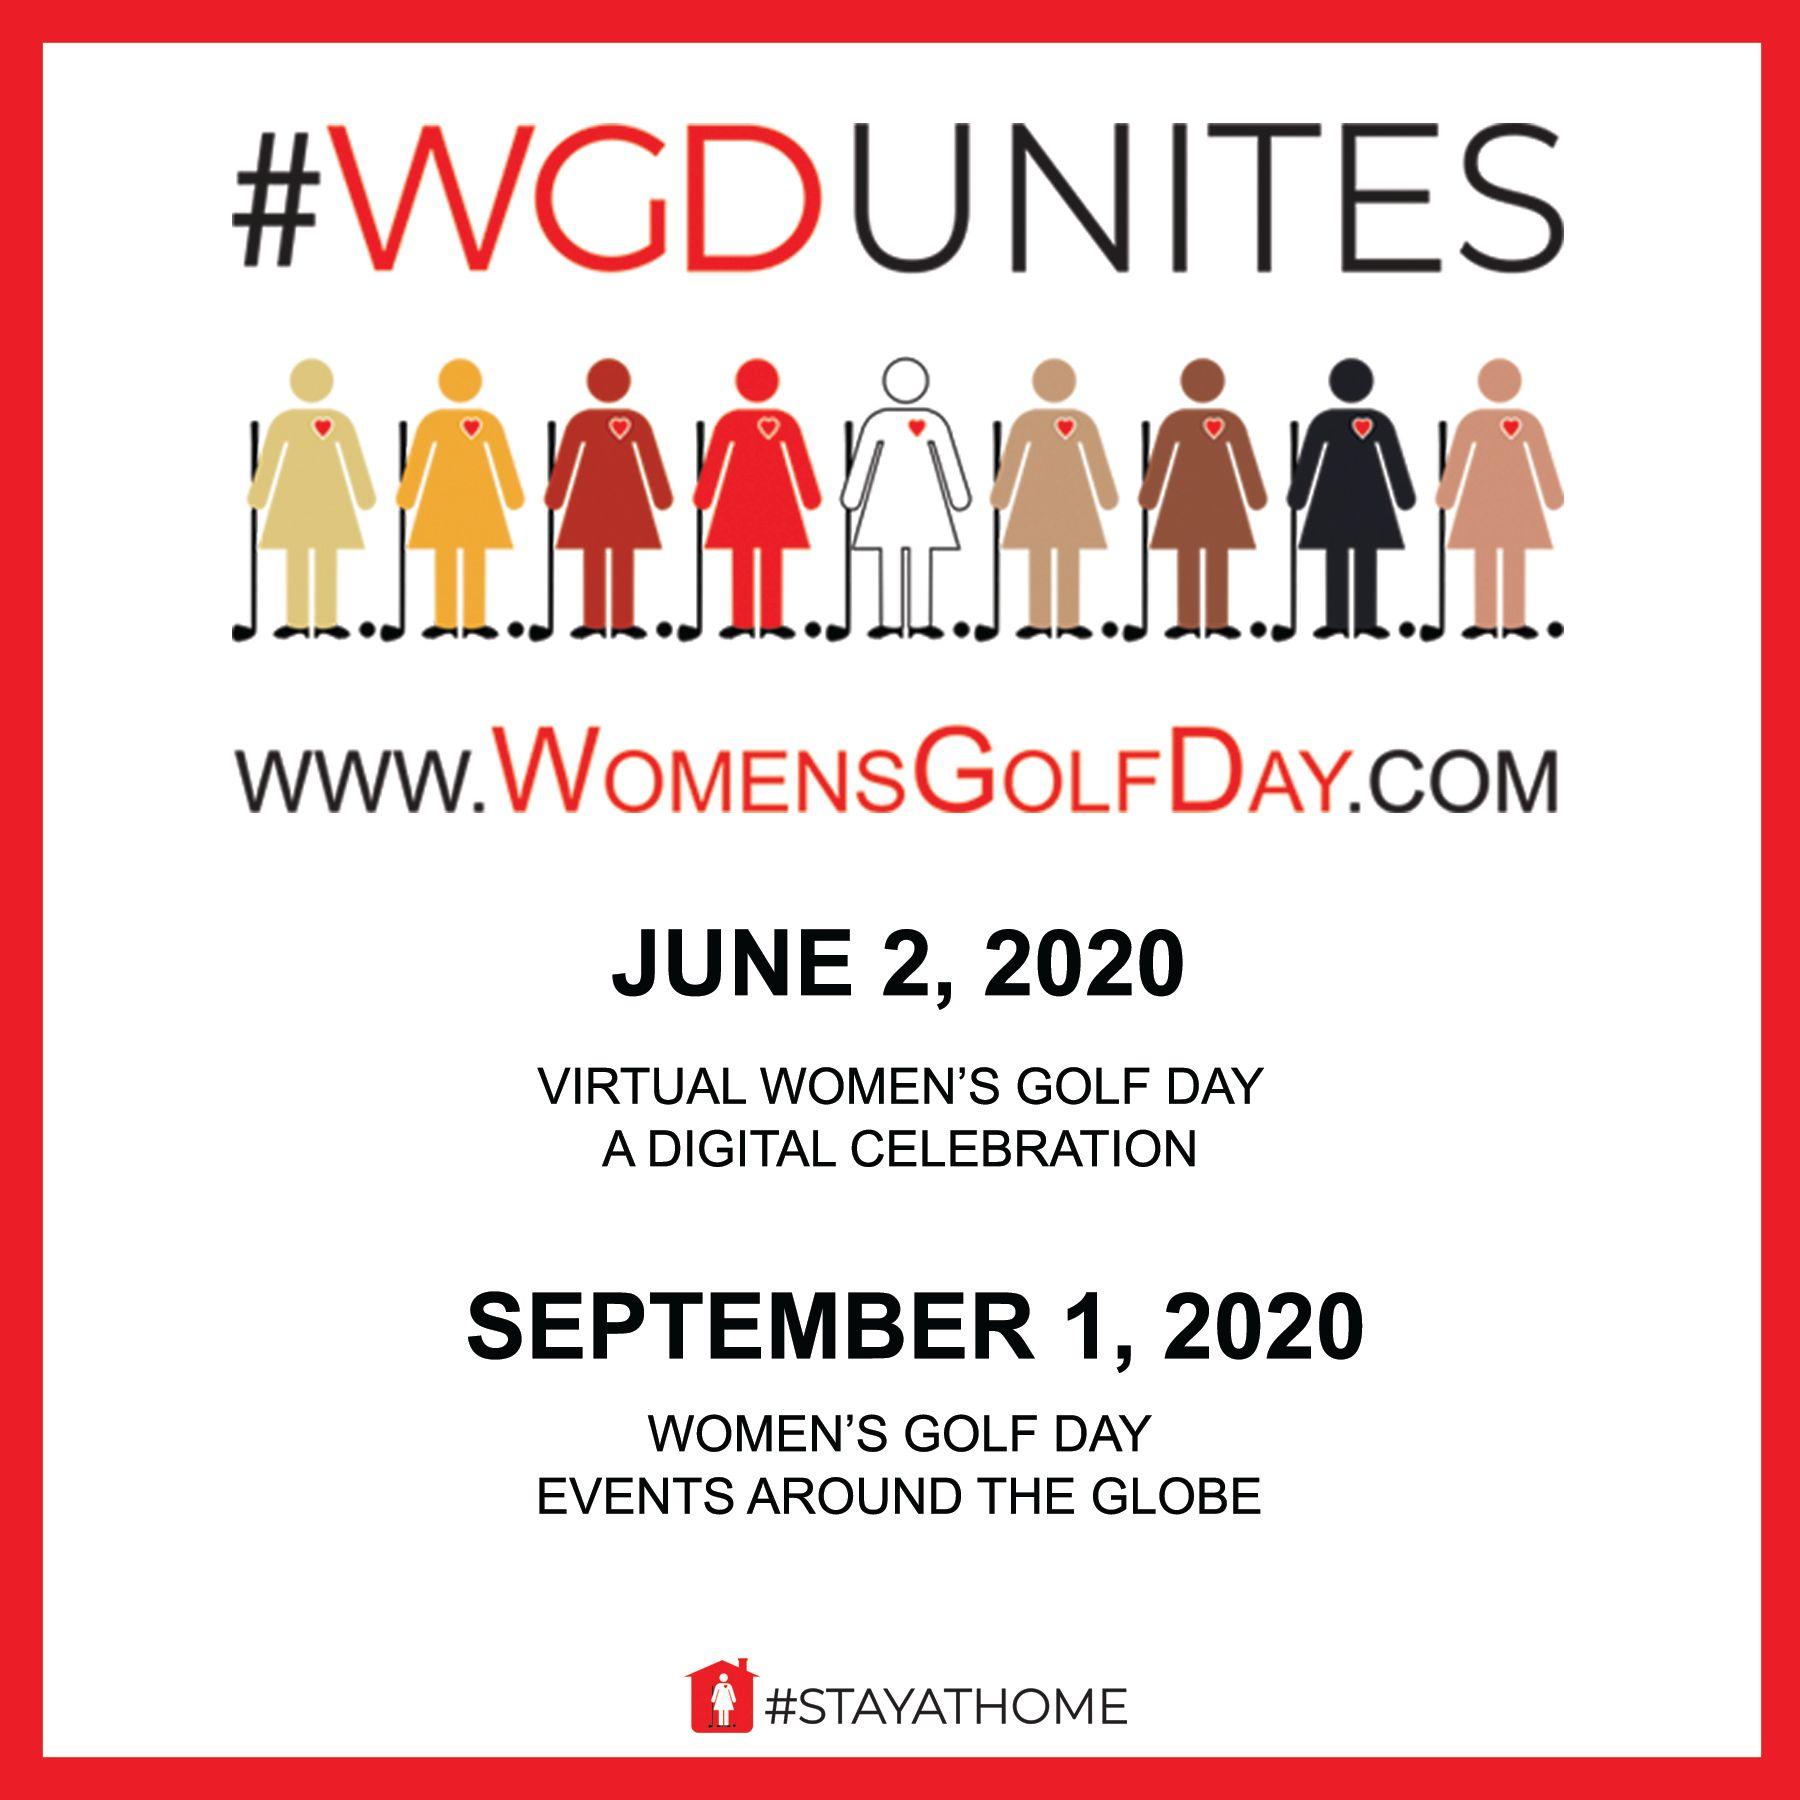 WGD Announcement social